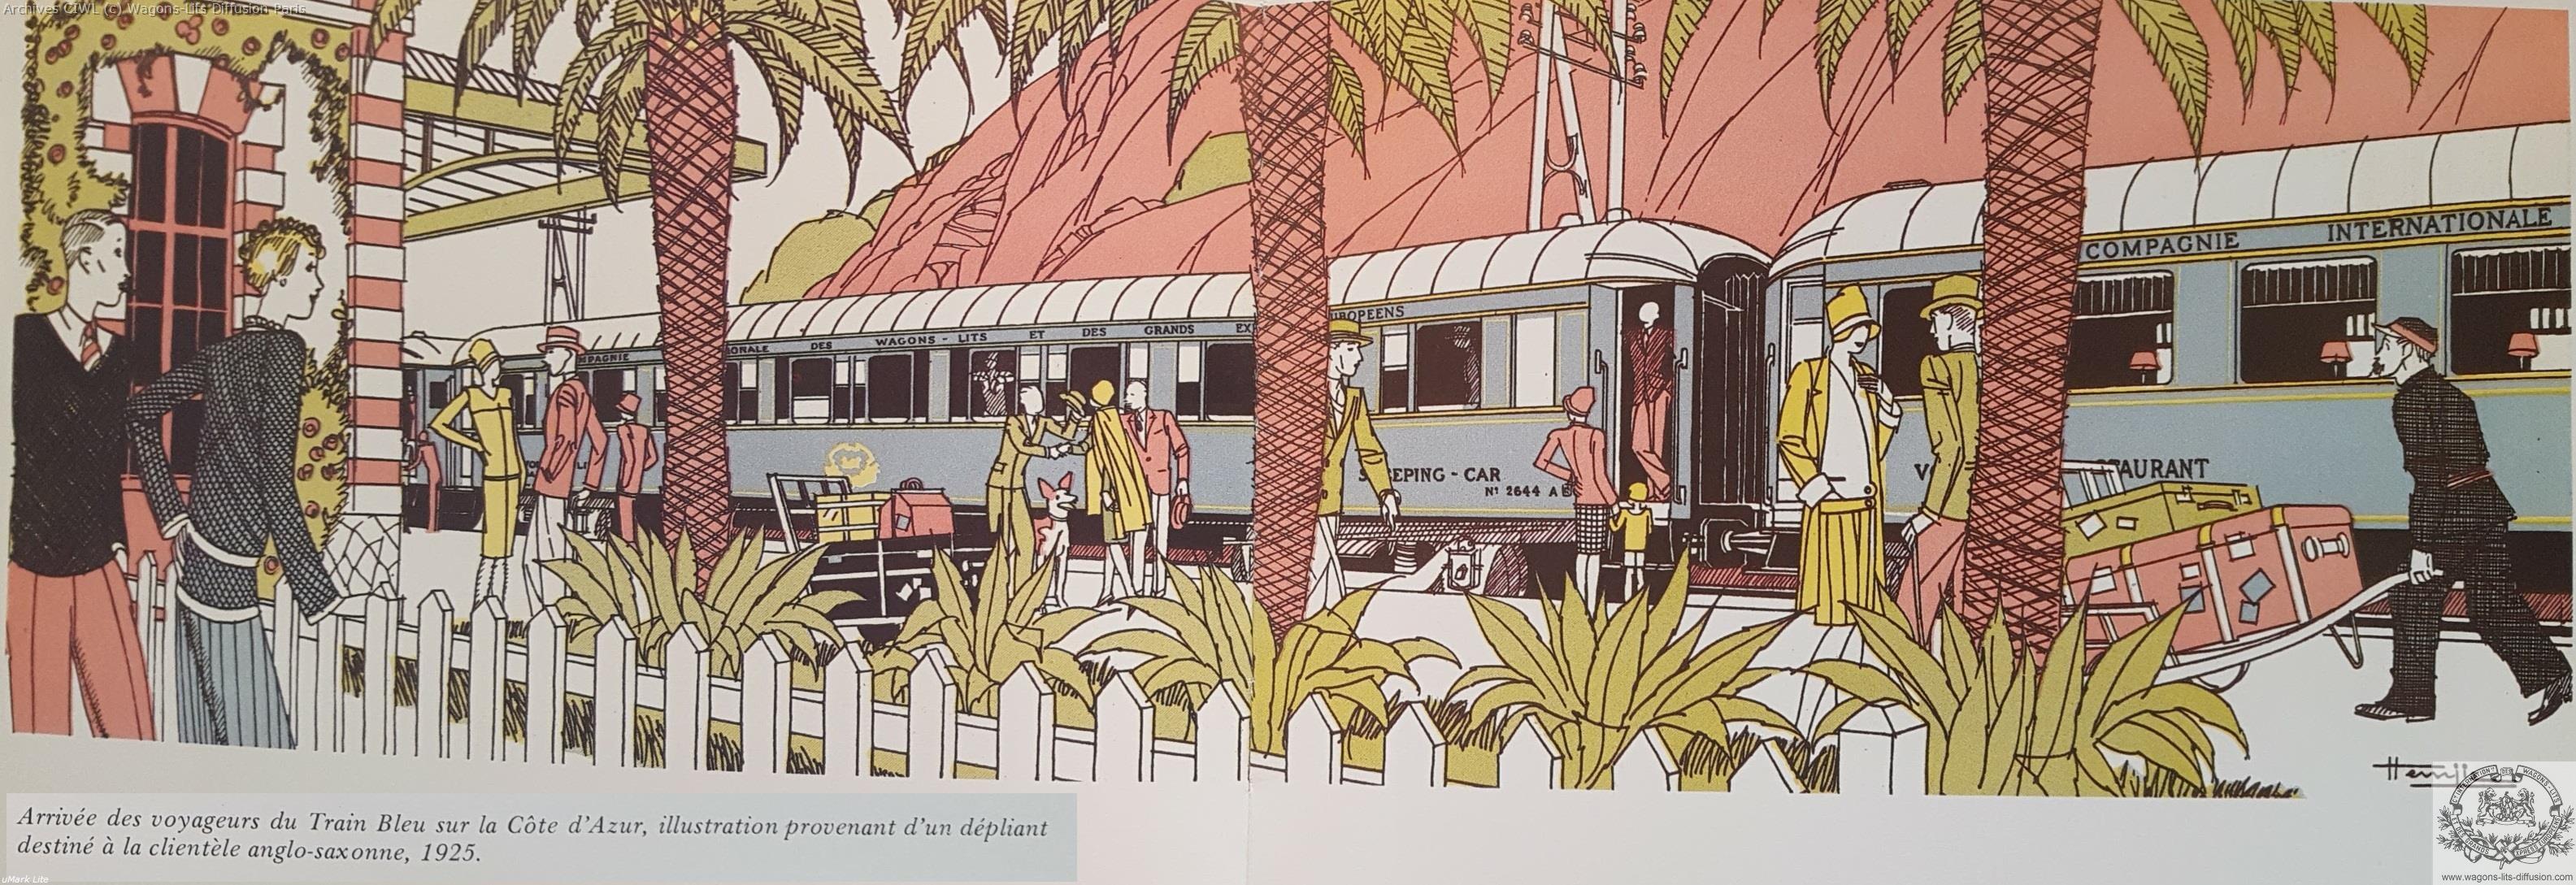 Wl train bleu cote d azur 1925